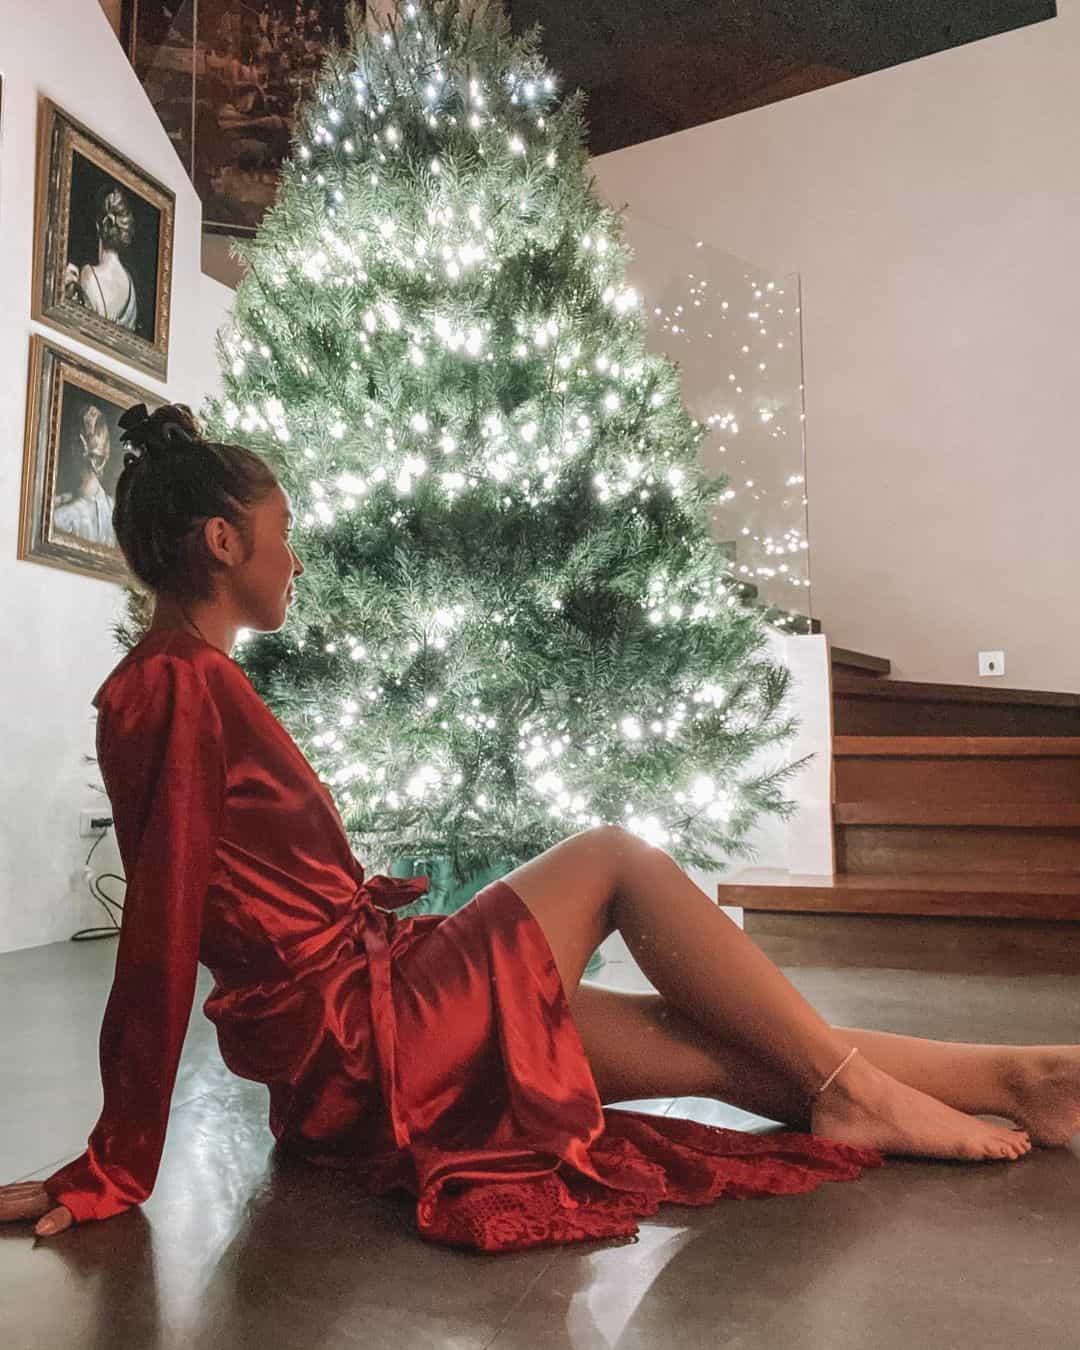 Julia Barretto's 2020 Christmas tree